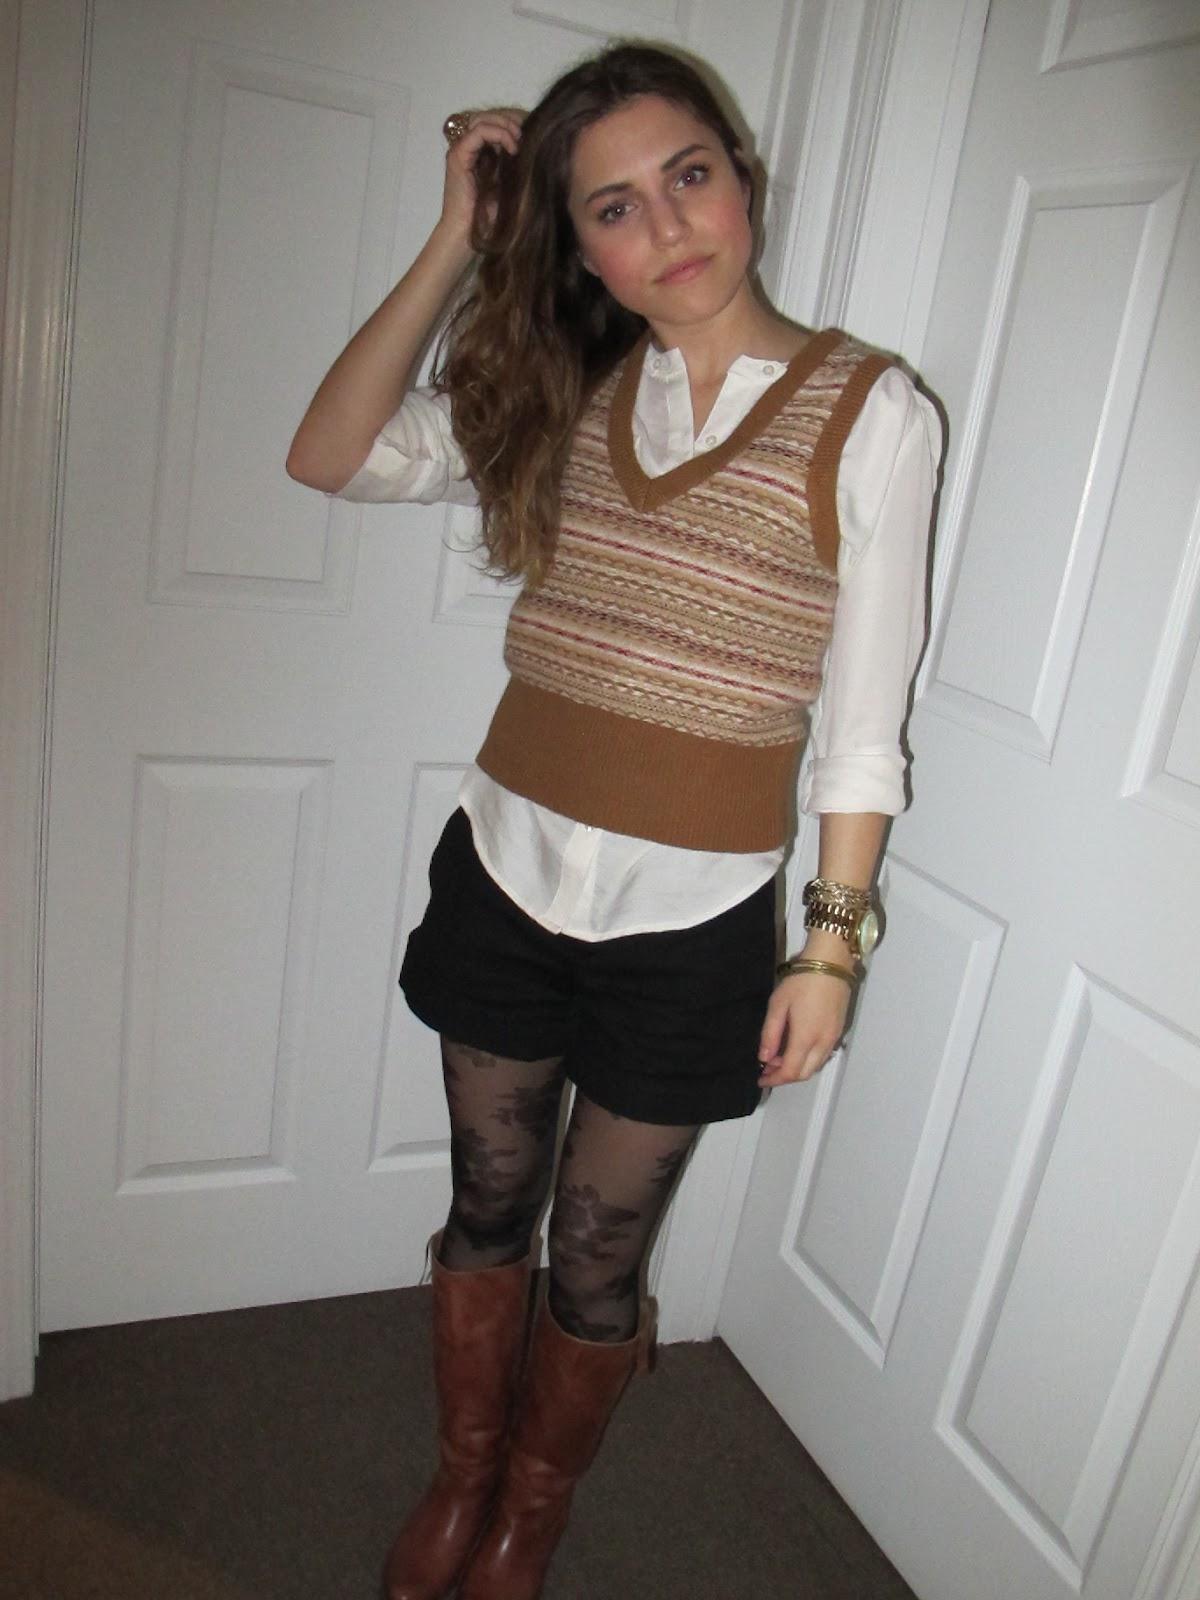 BOTTOM ROCKER: The Jackie Burkhart Sweater Vest